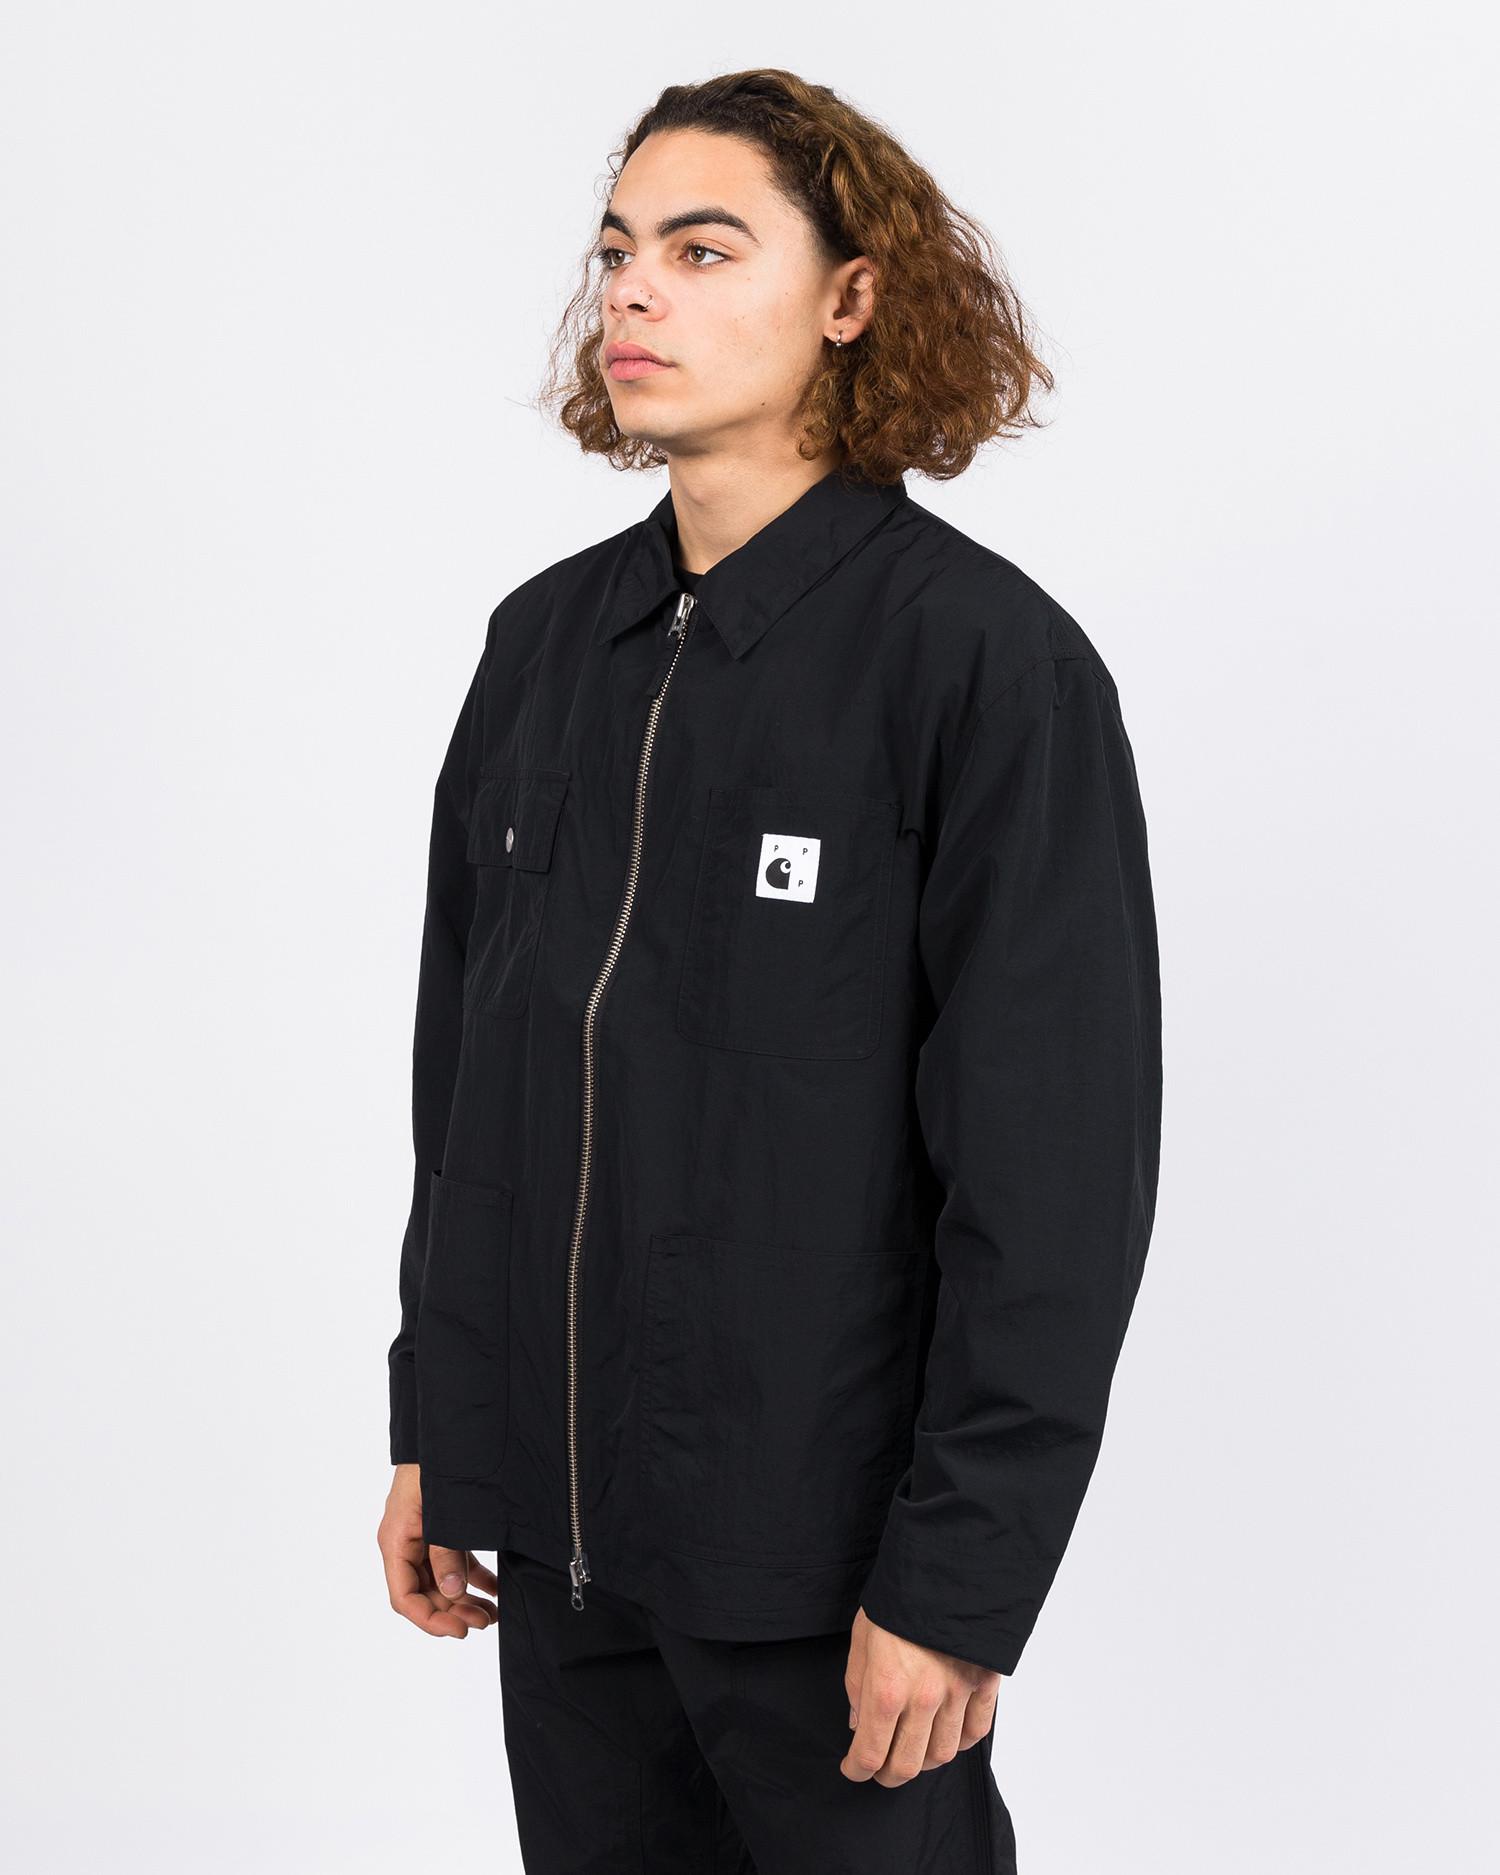 Carhartt x Pop Trading Co Michigan chore coat black